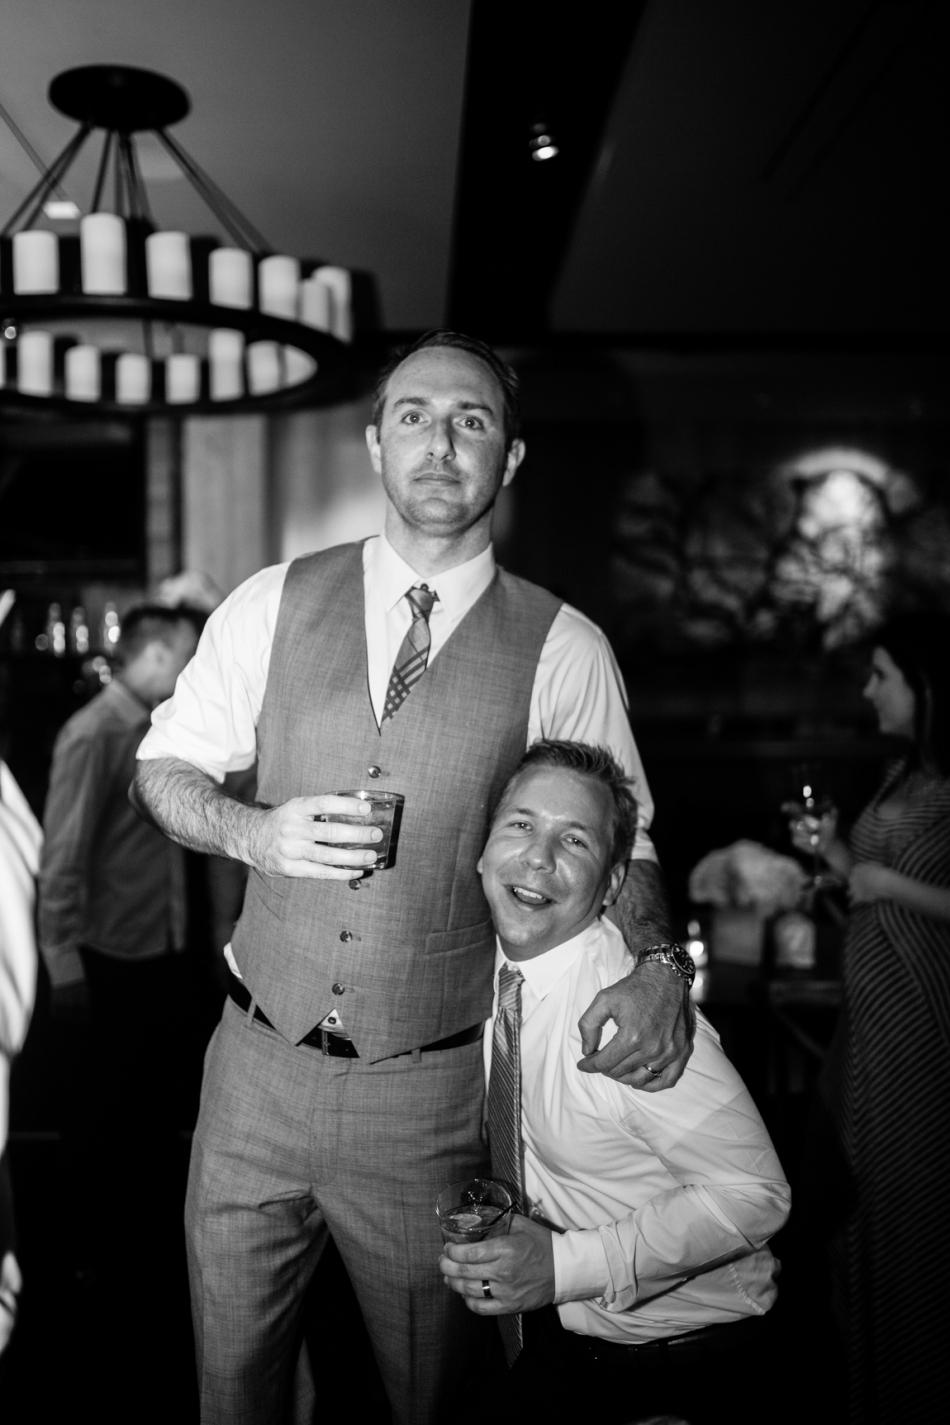 farmers_table_boca_raton_wedding_photographer-39